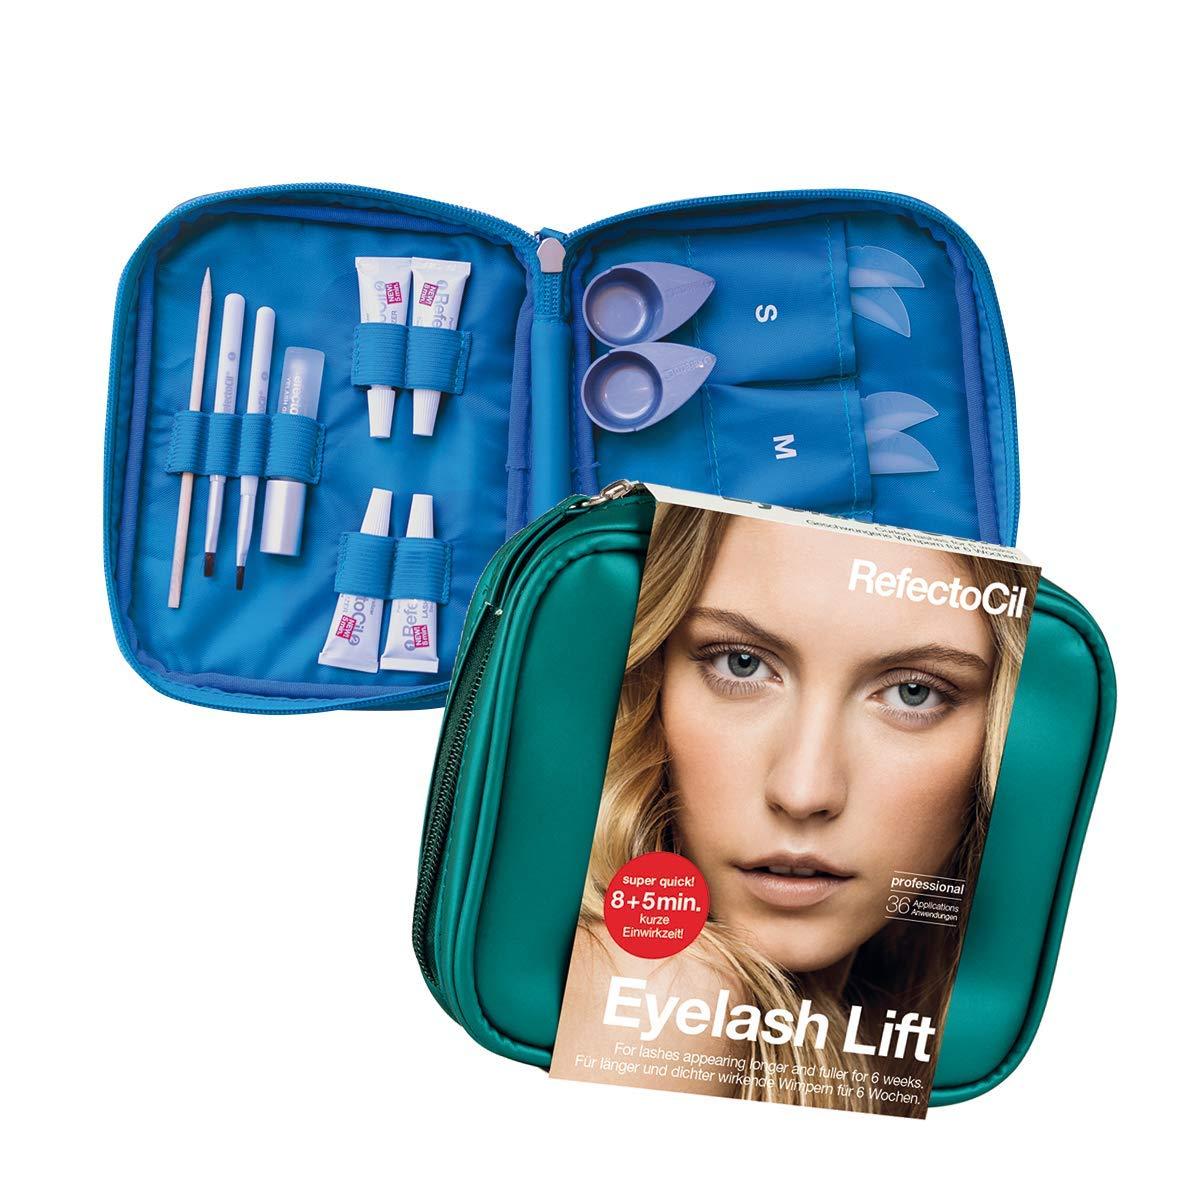 ae25ba9114c Amazon.com: Refectocil Eyelash Lift: Beauty